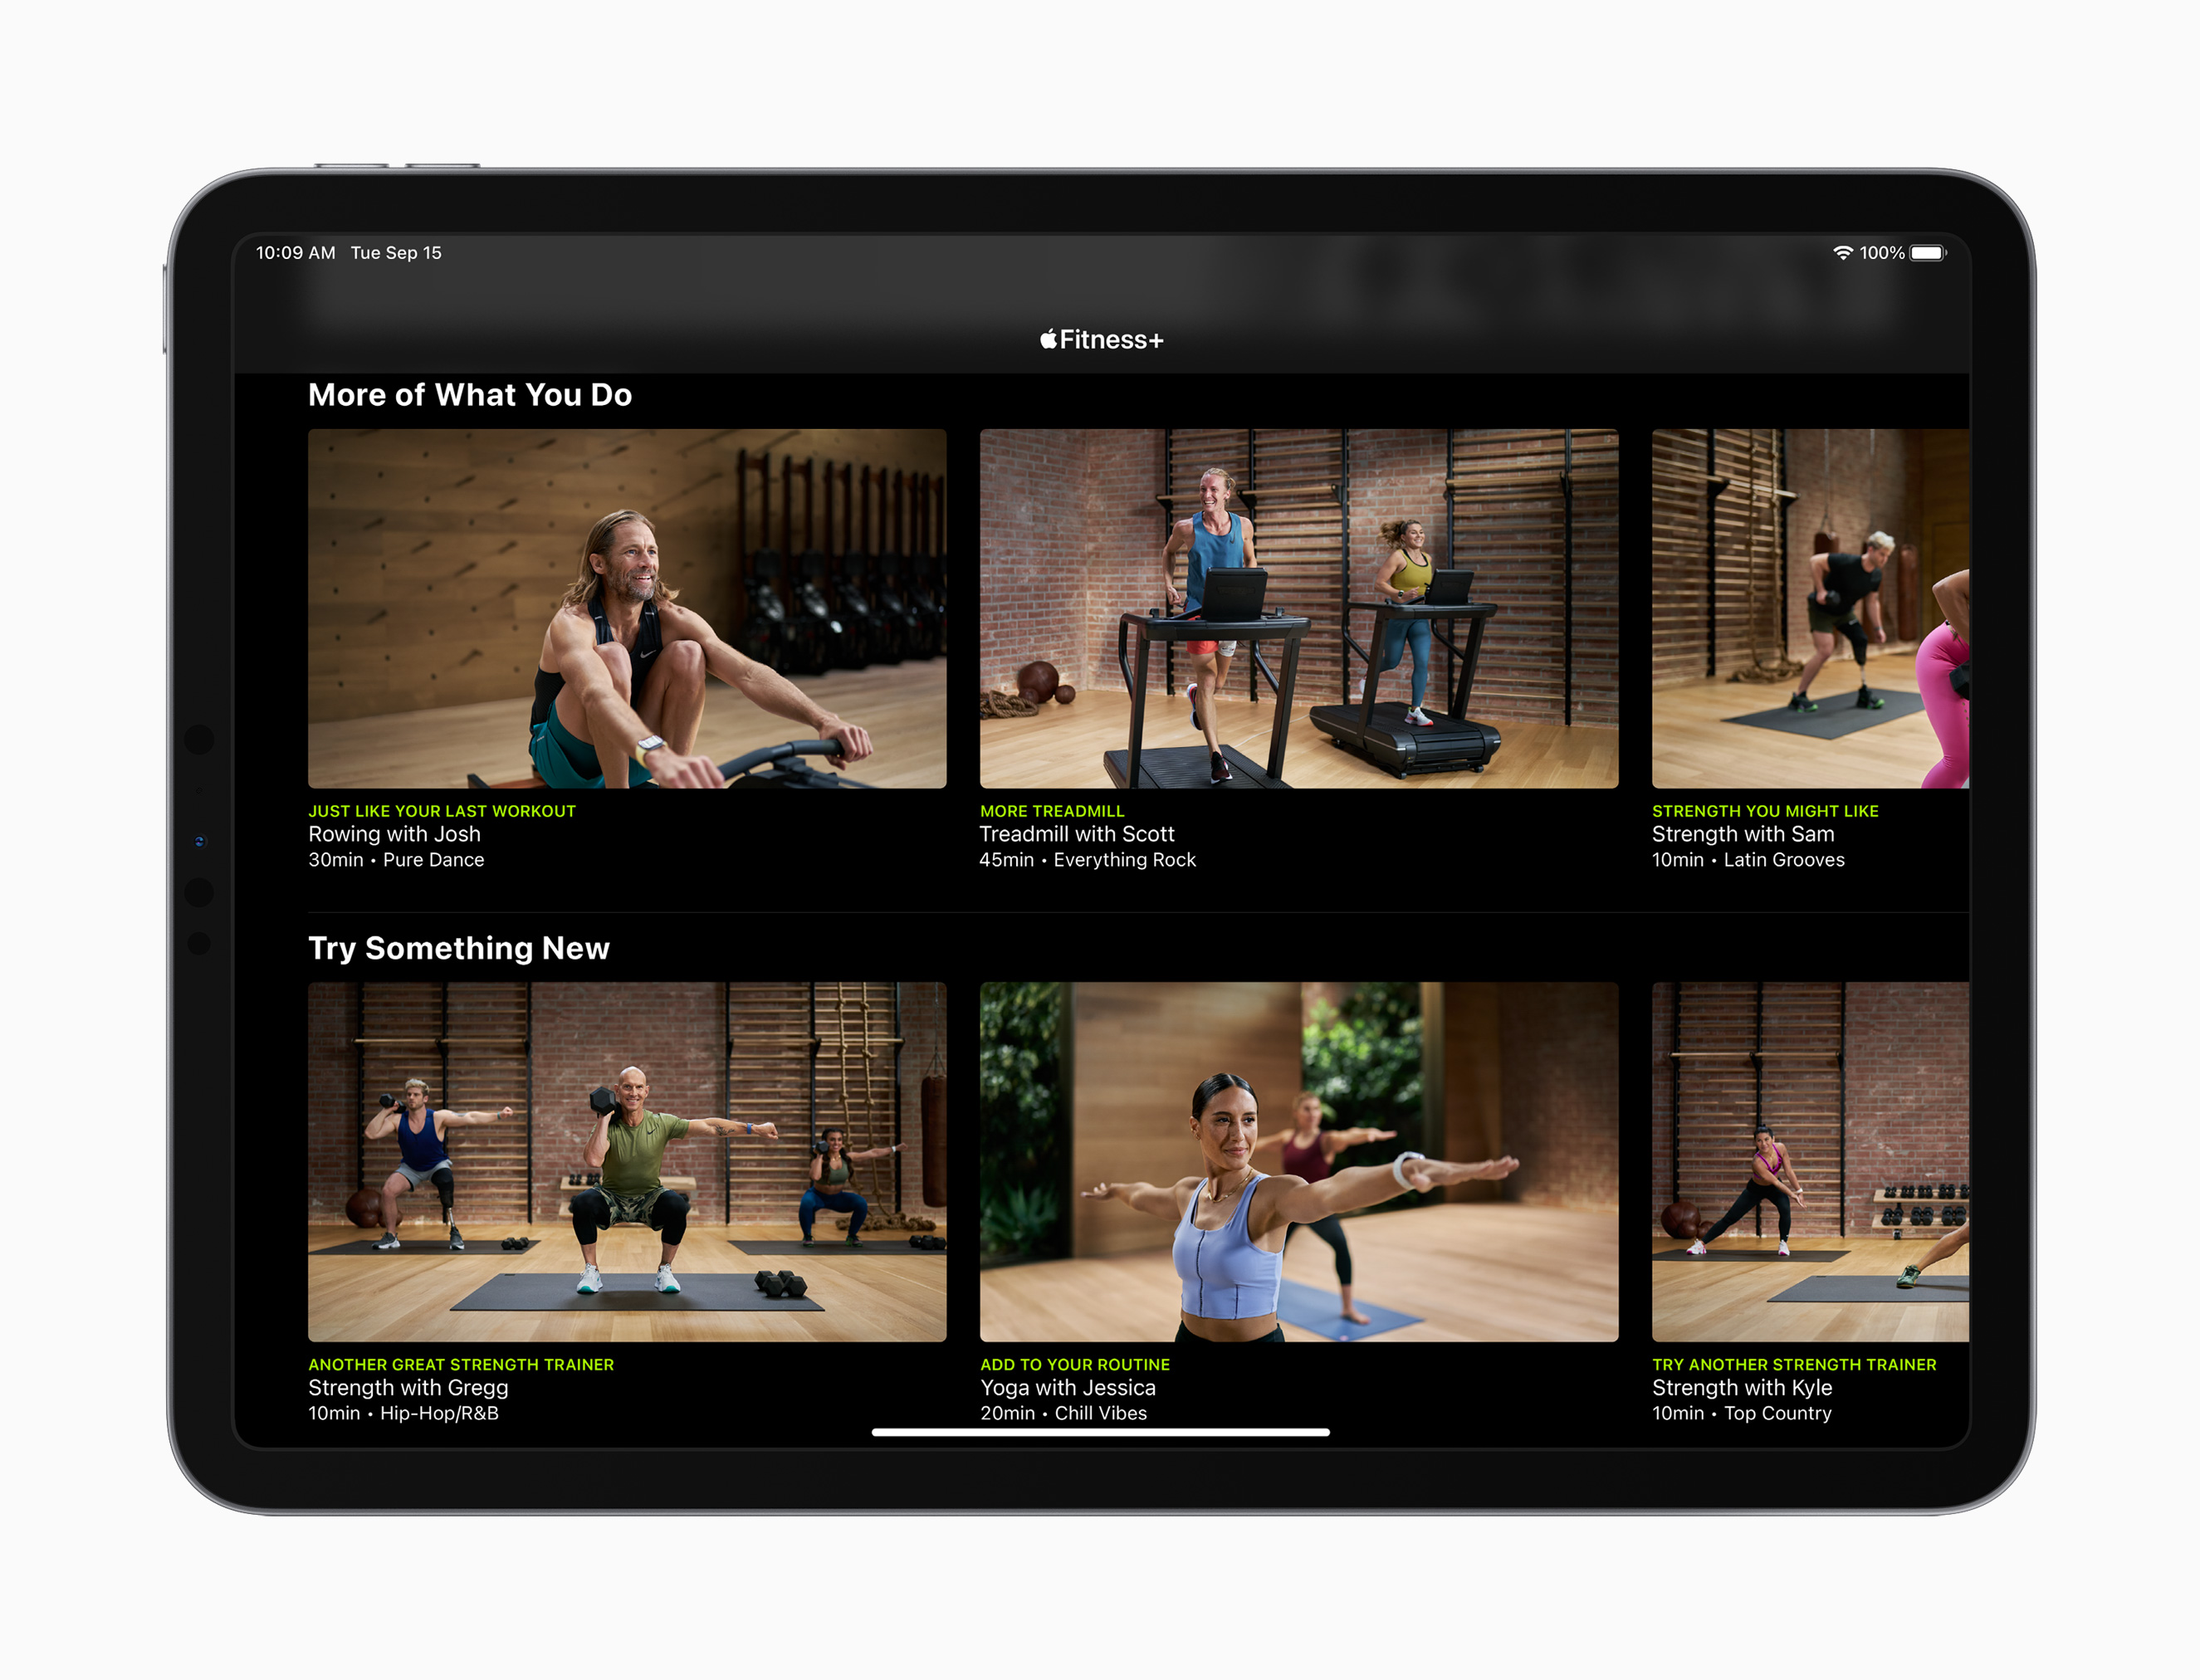 apple fitness program on iPad screen